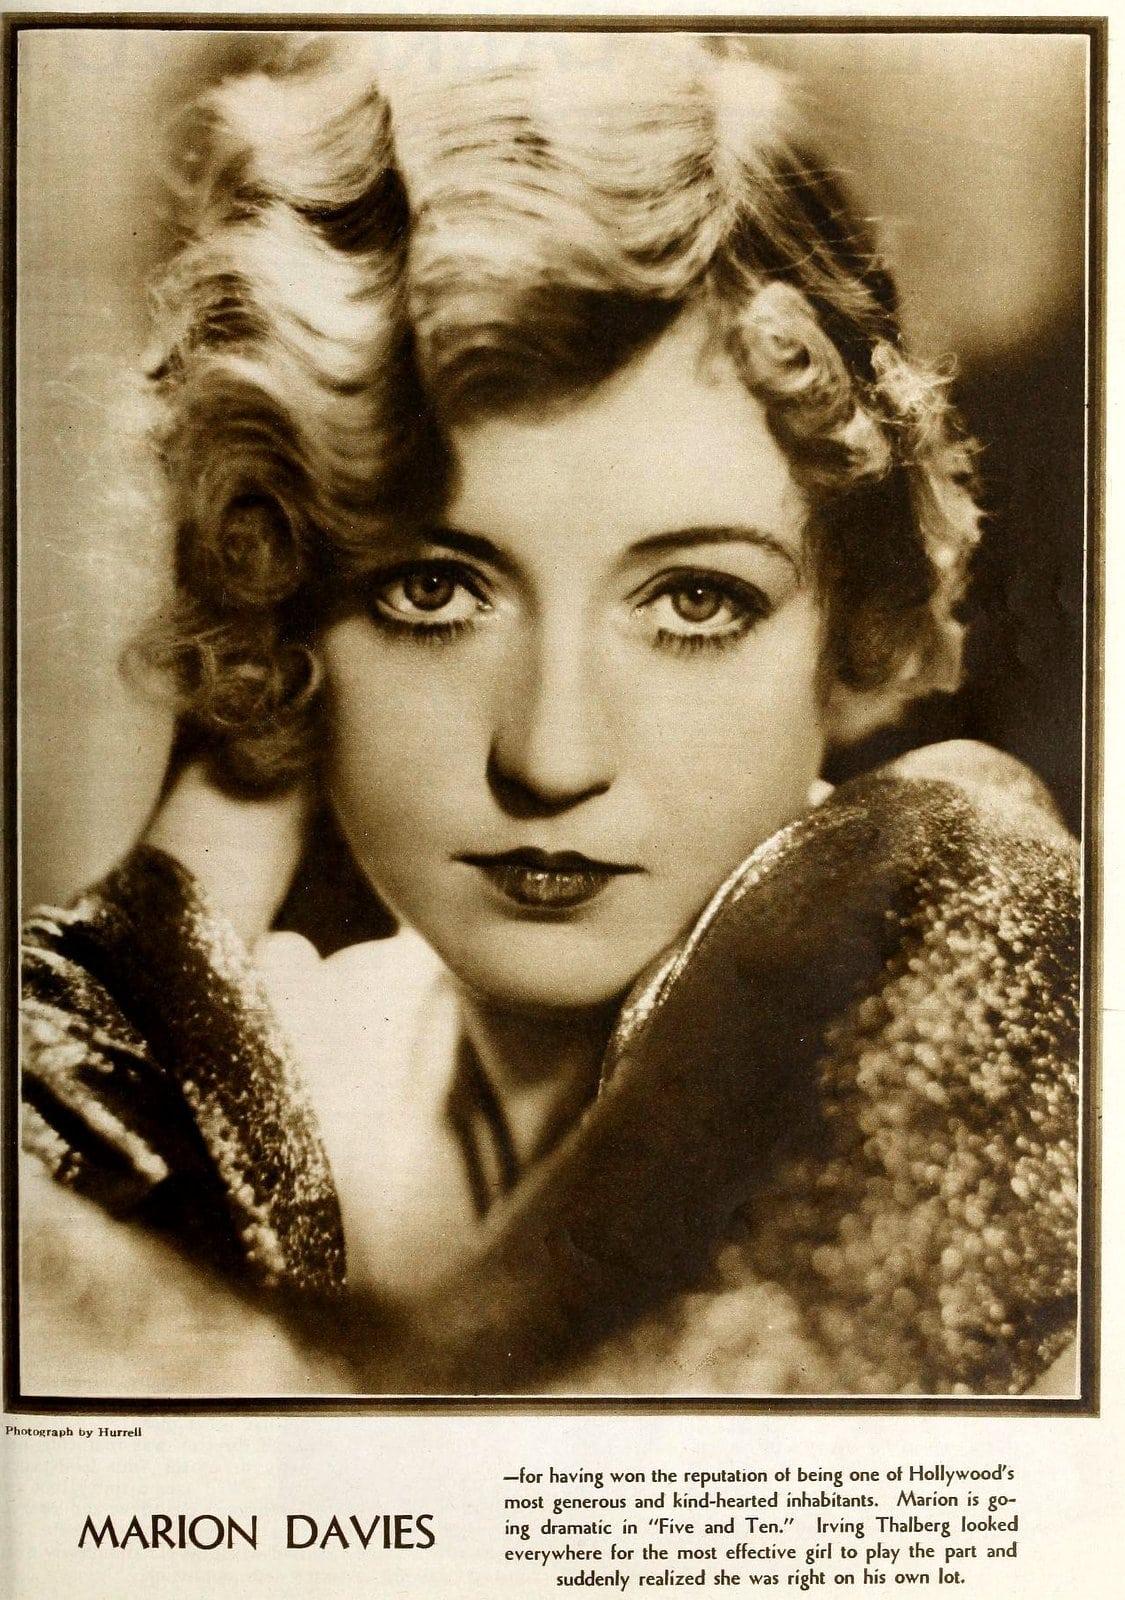 Vintage 1930s acress Marion Davies